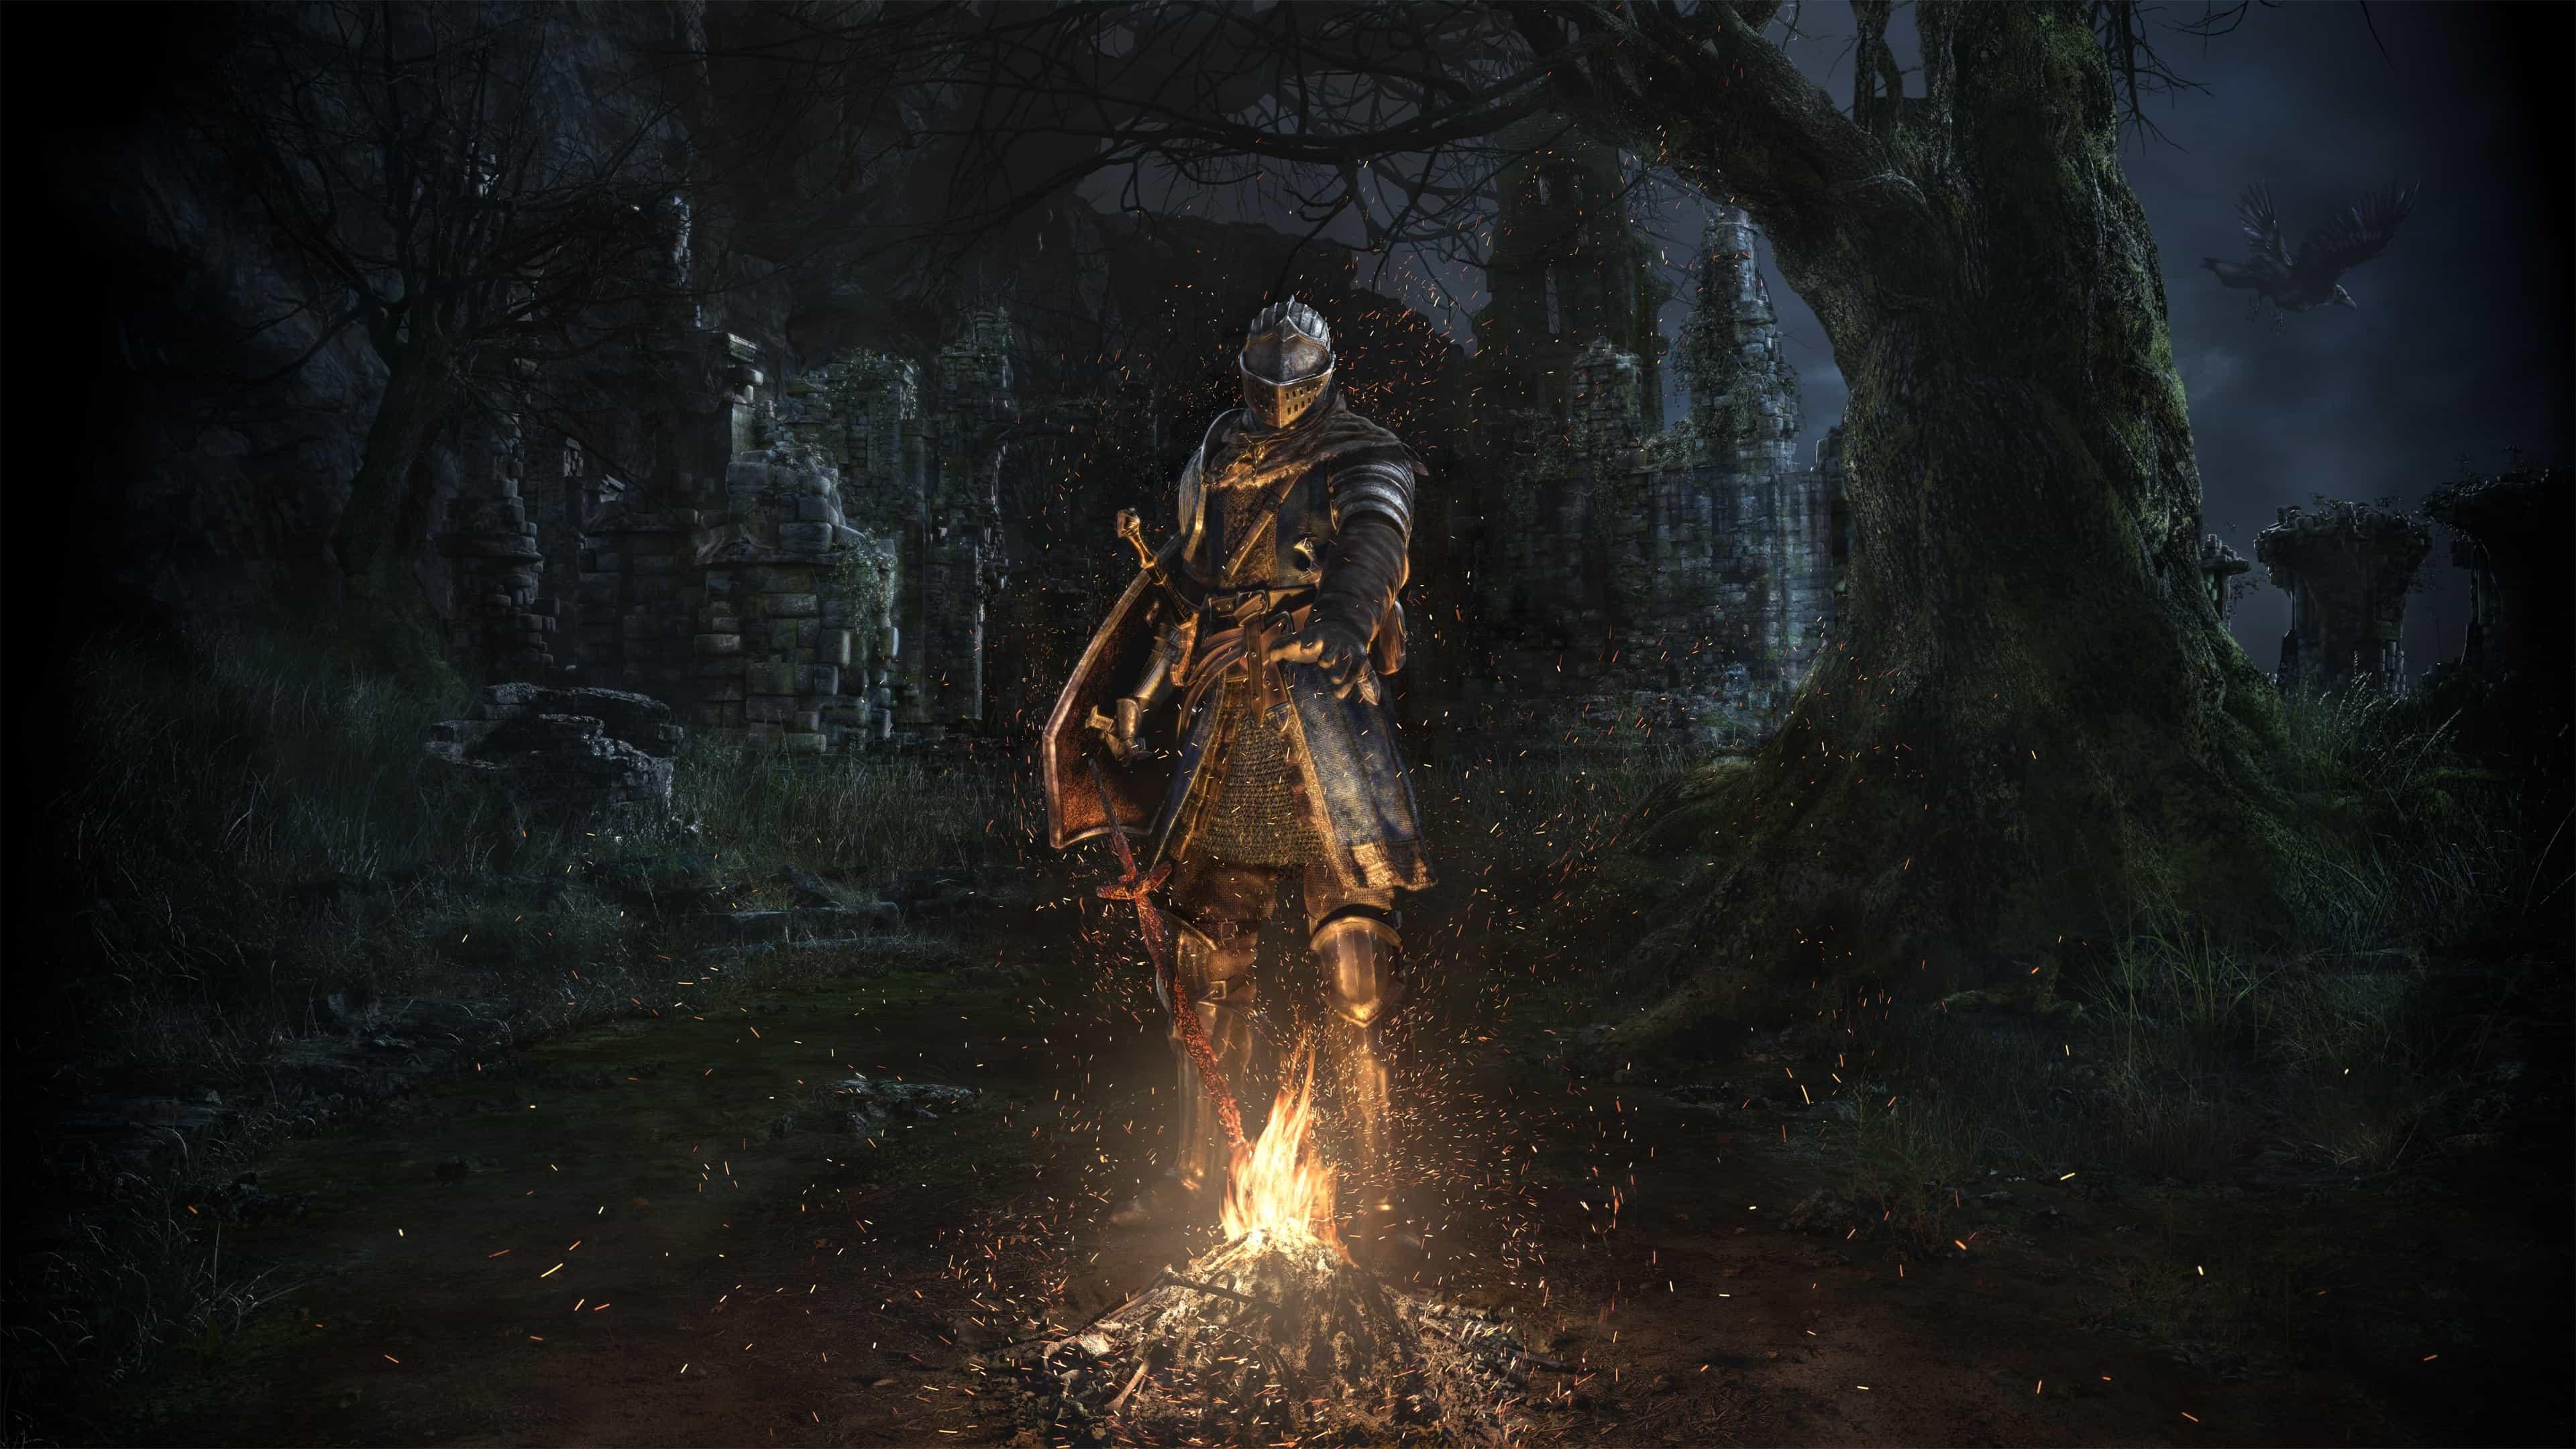 22+] Dark Souls Remastered Wallpapers